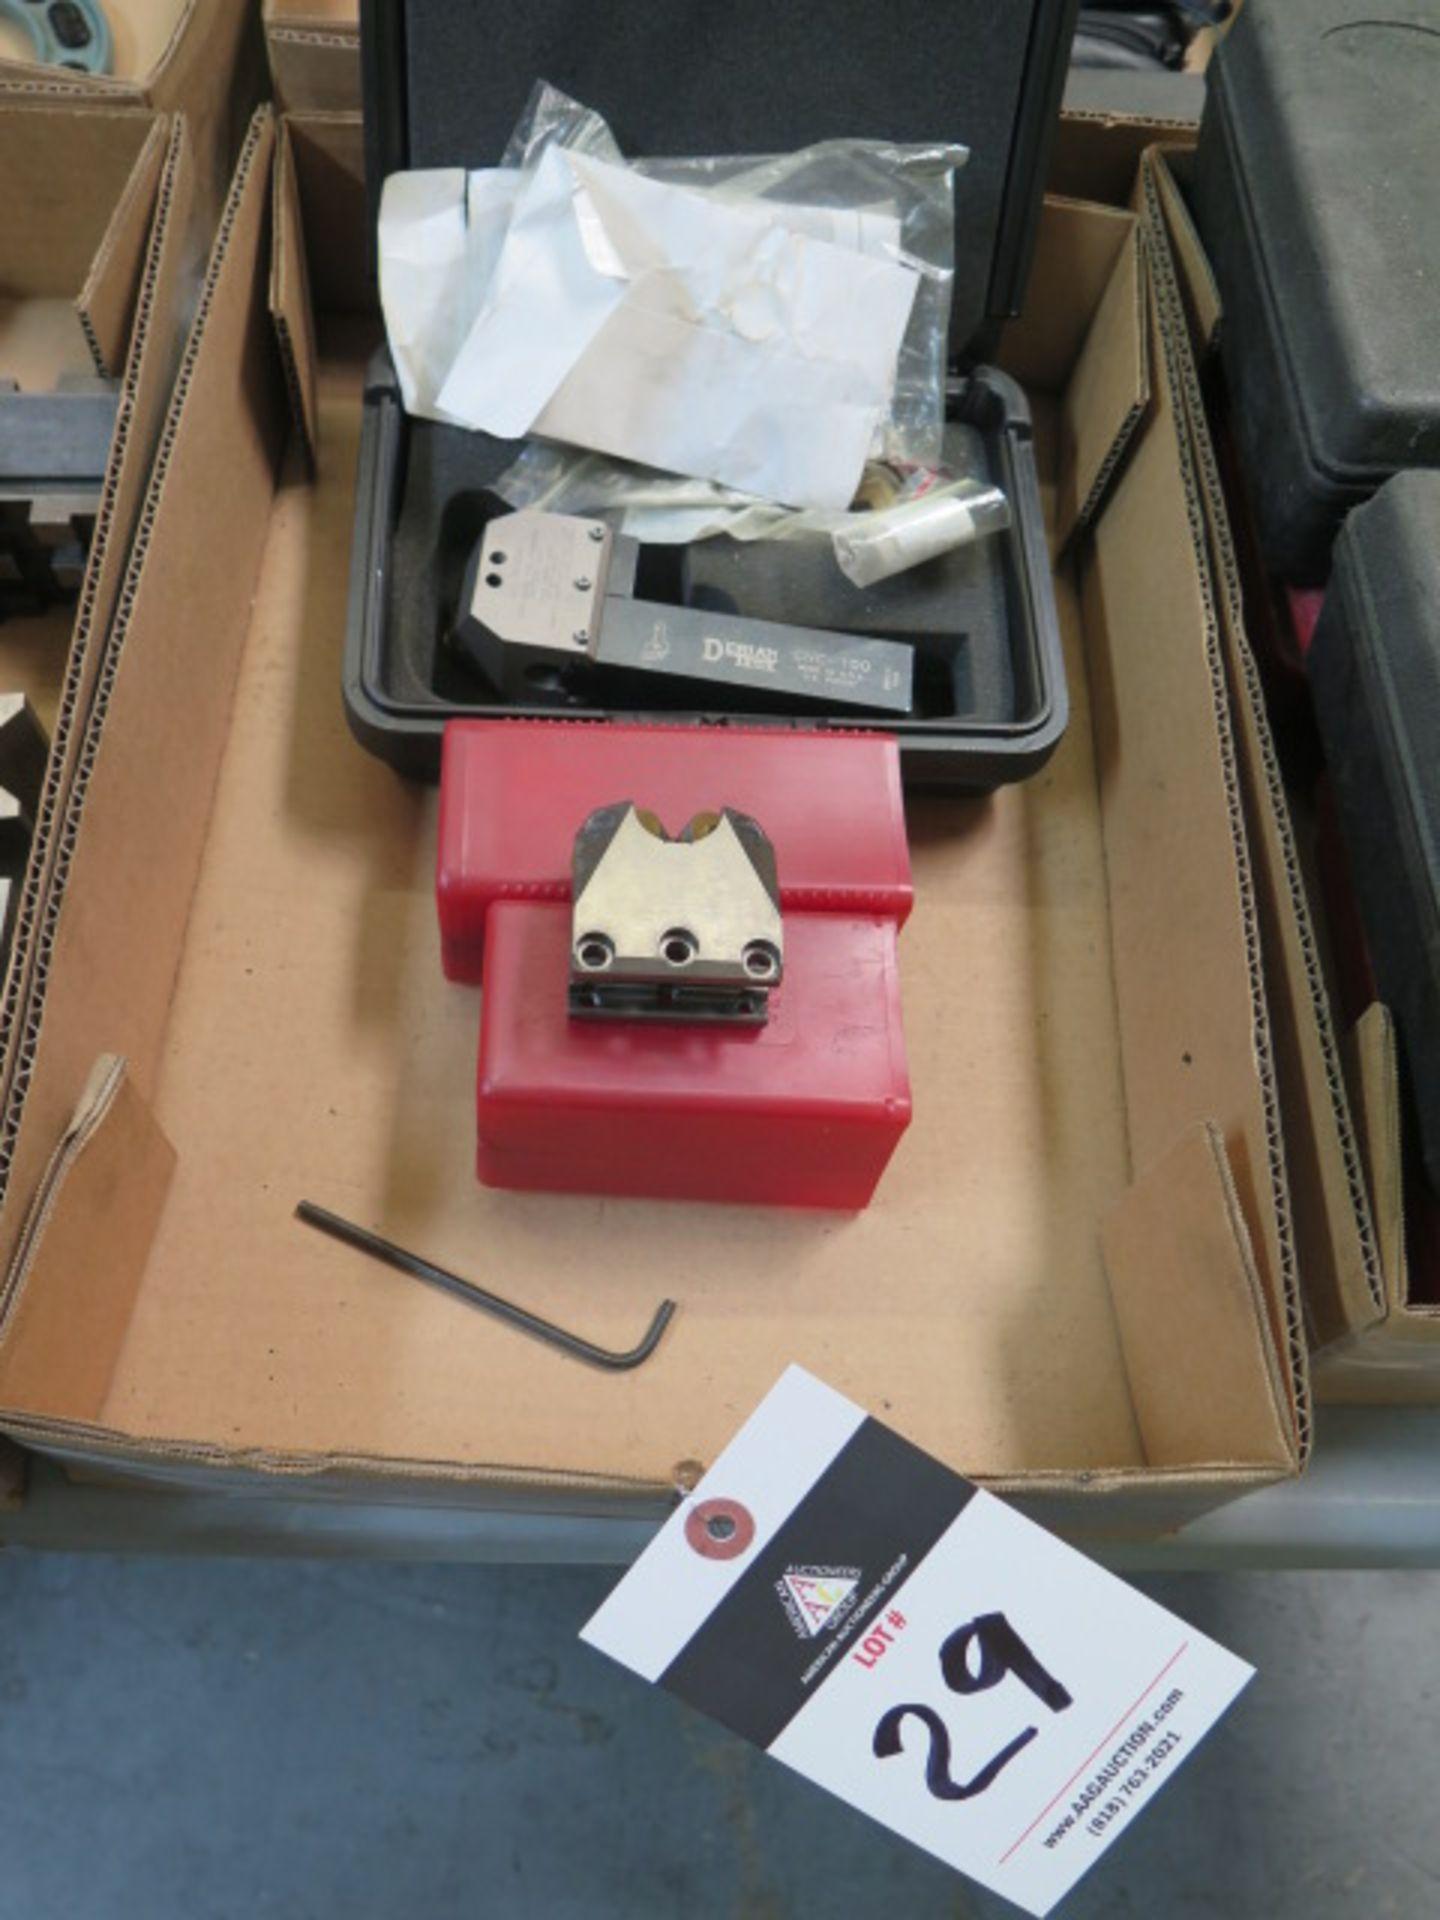 Lot 29 - Dorain CNC-100 Precision Knurling Tool w/ Secondary Head